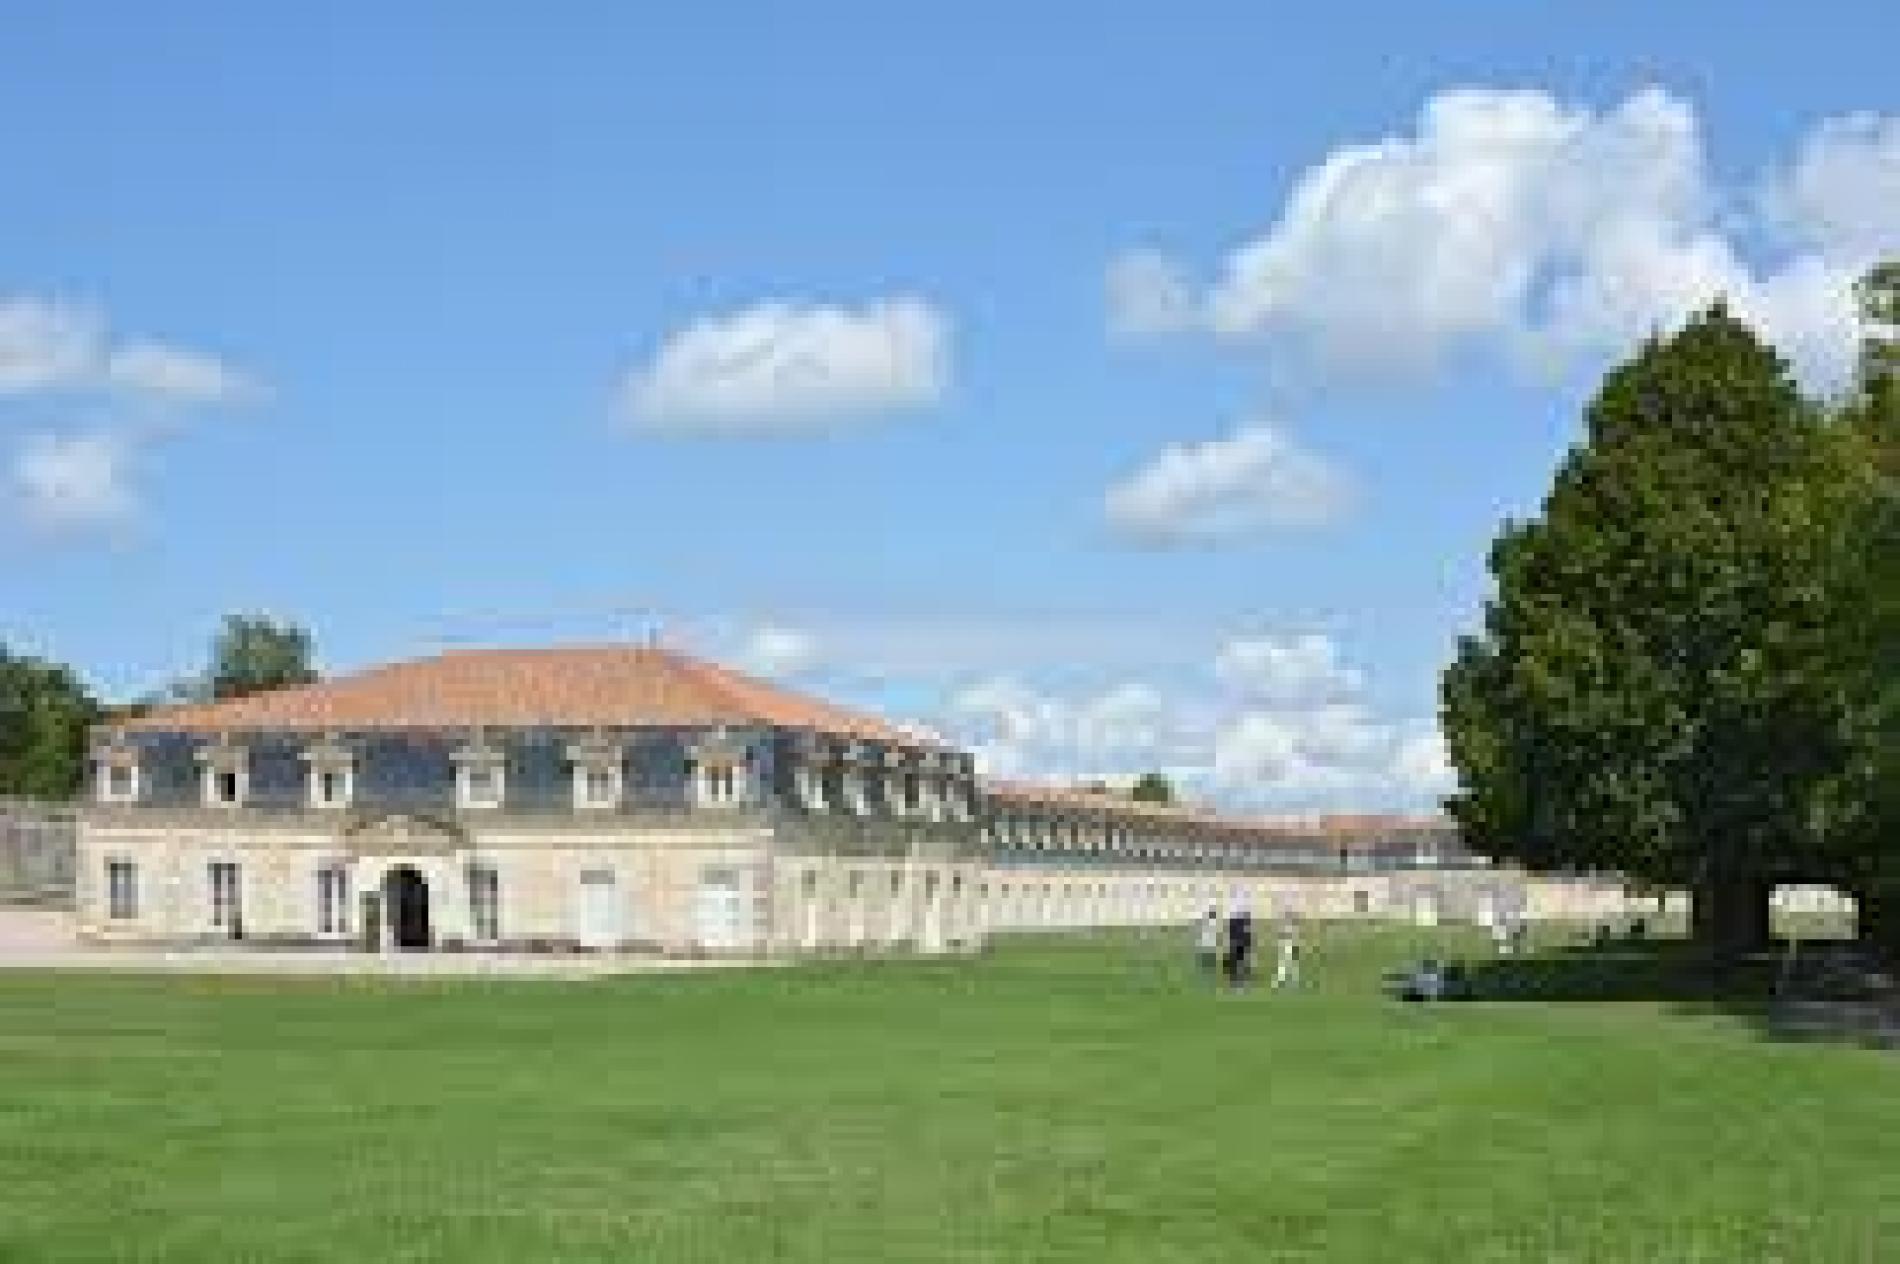 La corderie Royale, Rochefort